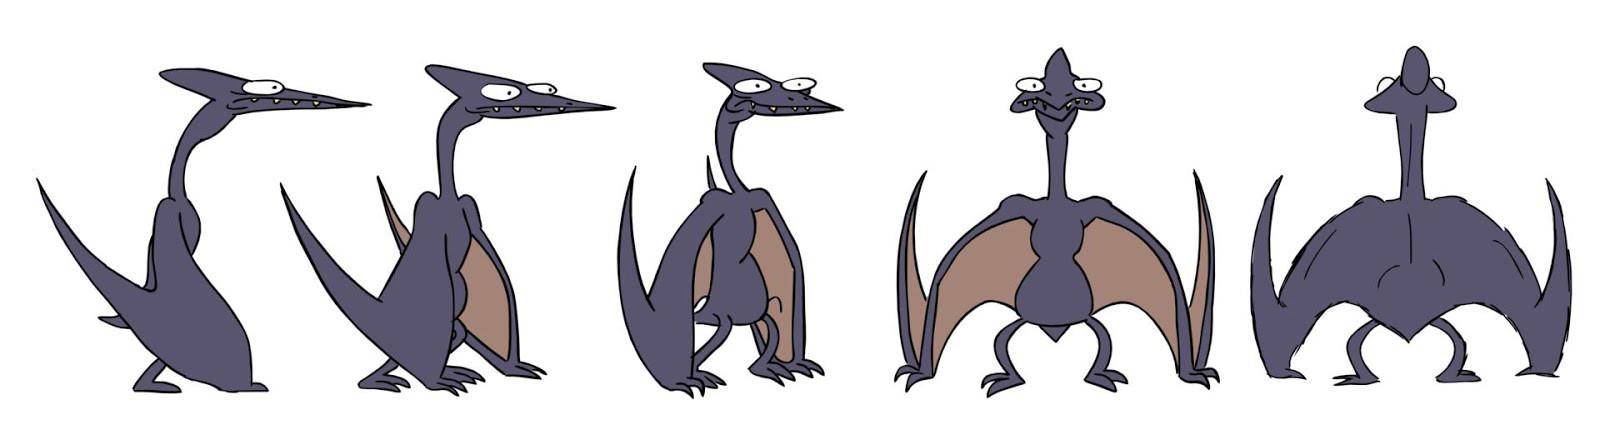 pterosaur turn around